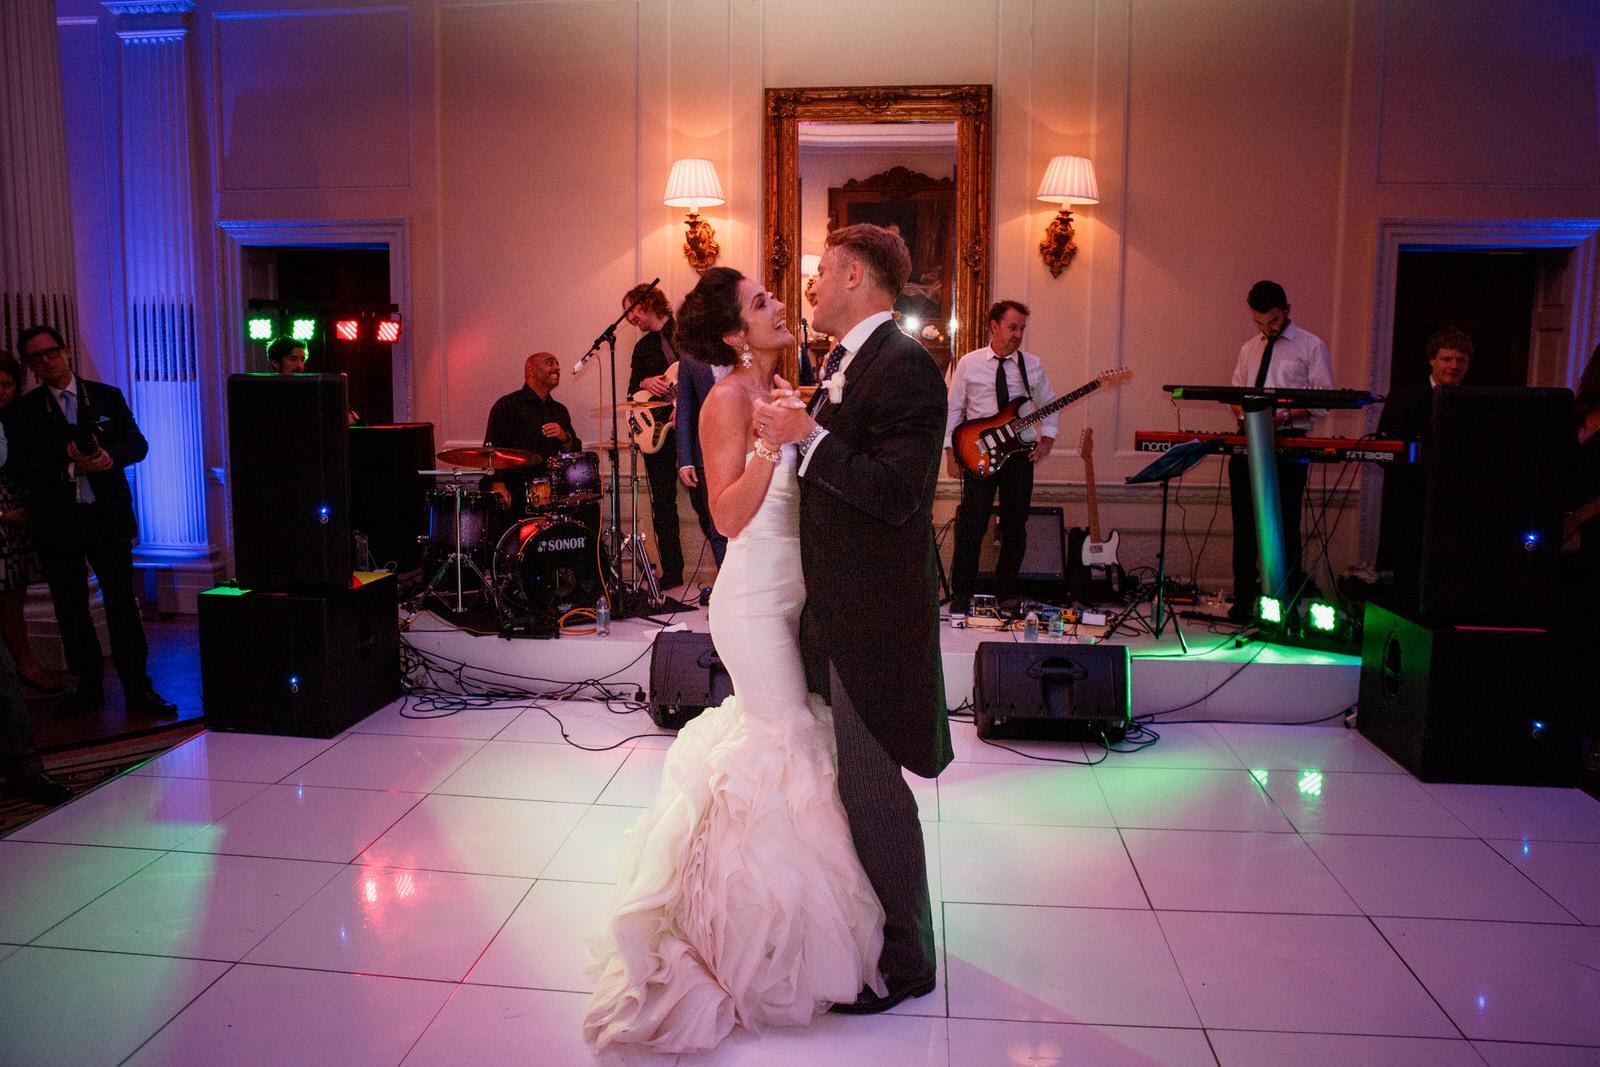 Home counties wedding photography by Damion Mower on English-Wedding.com (20)